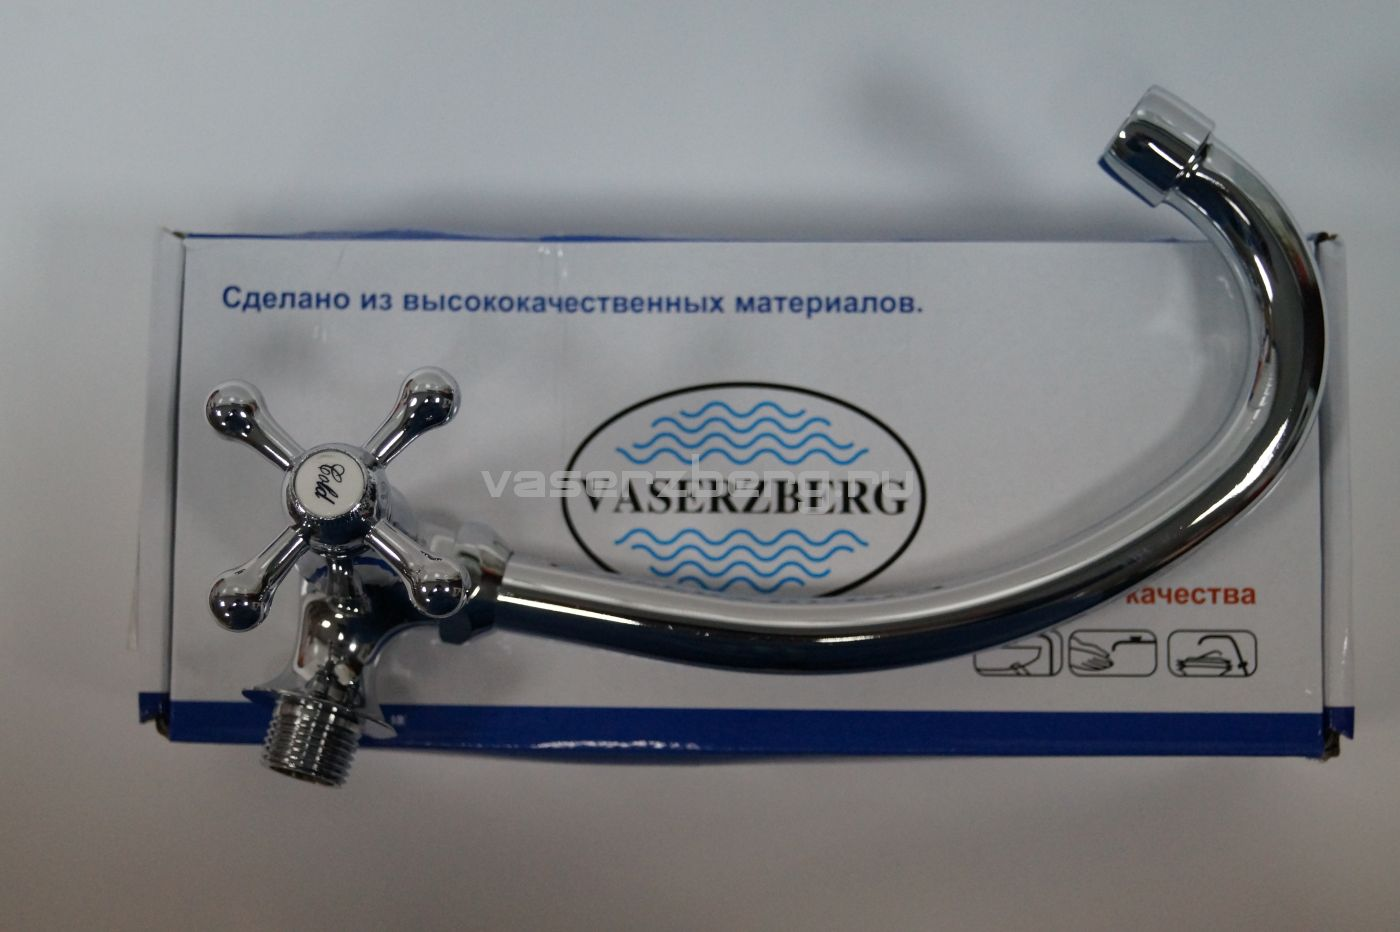 Vaserzberg Латунный одинарный кран от стены, АА-8001